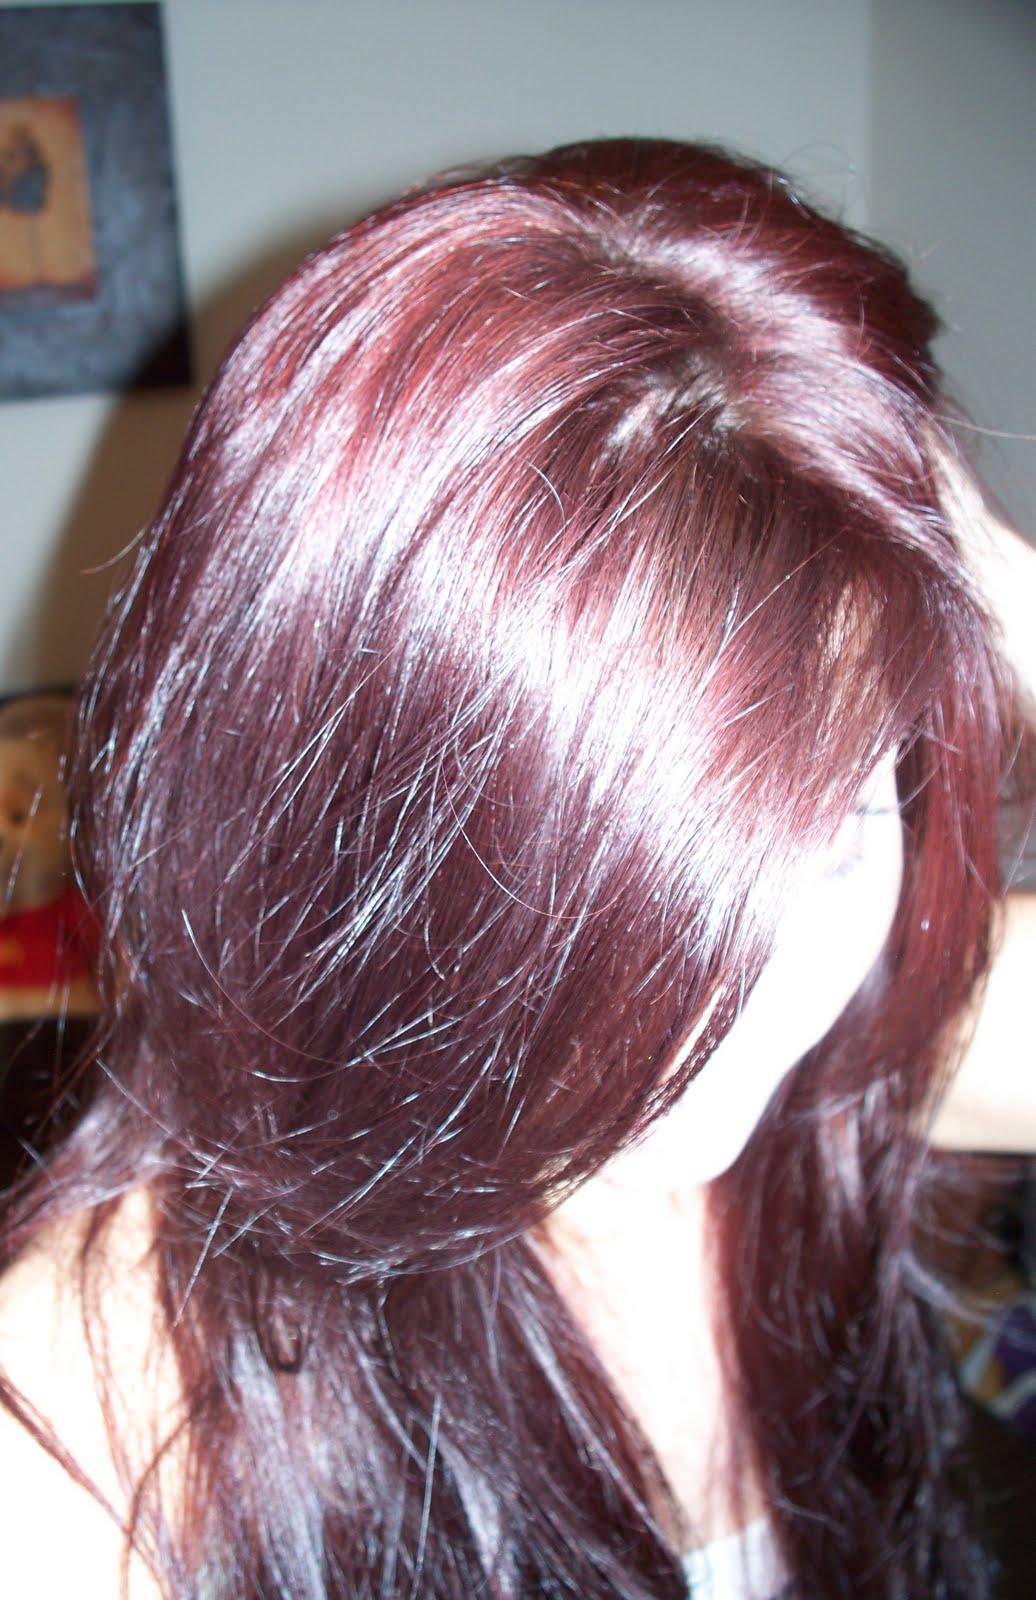 Xxl Live Hair Dye Results Dizzybrunette